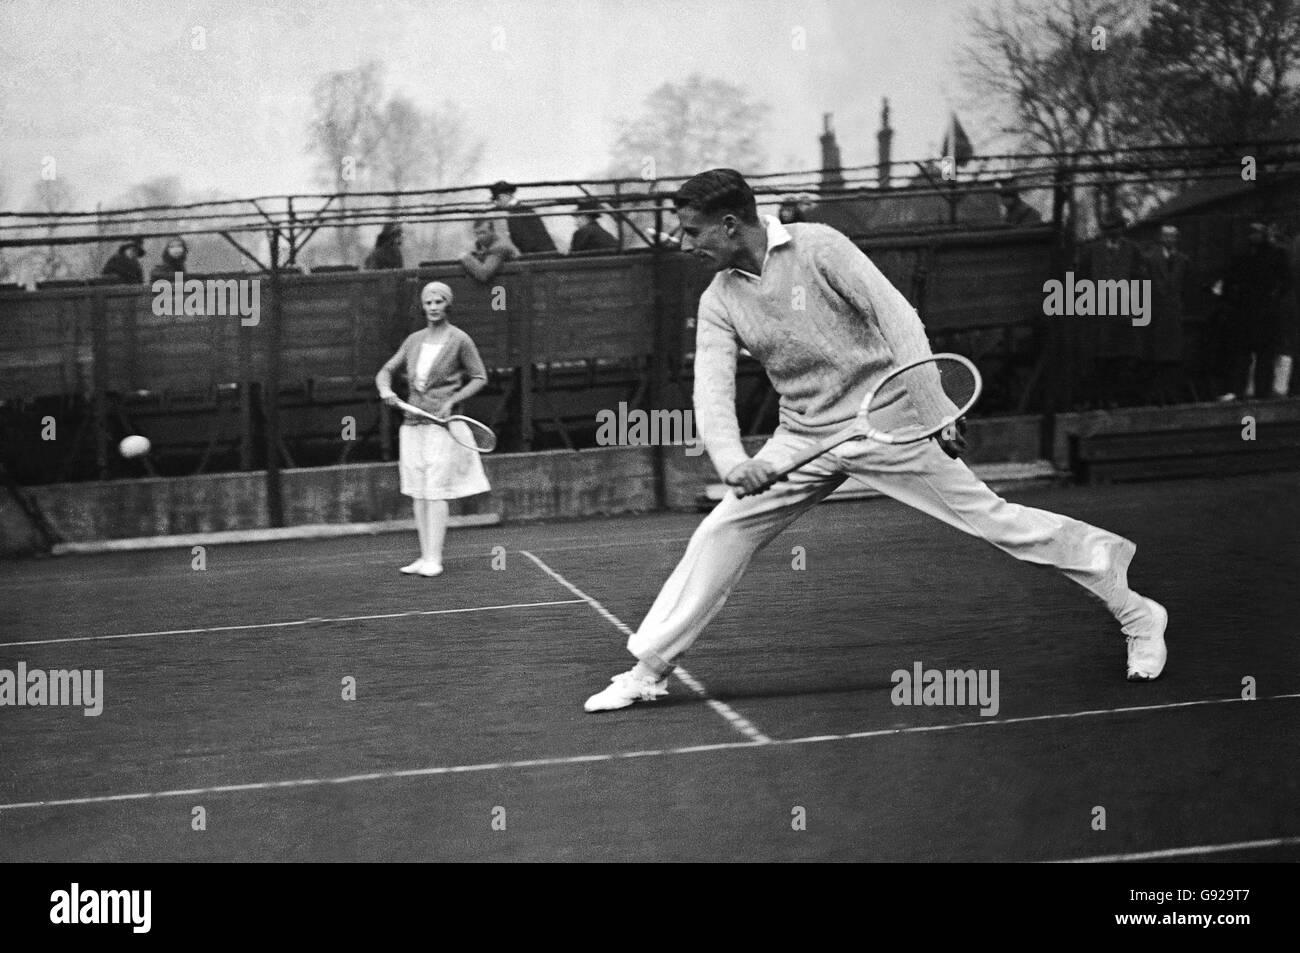 Tennis - HW (Bunny) Austin - Stock Image